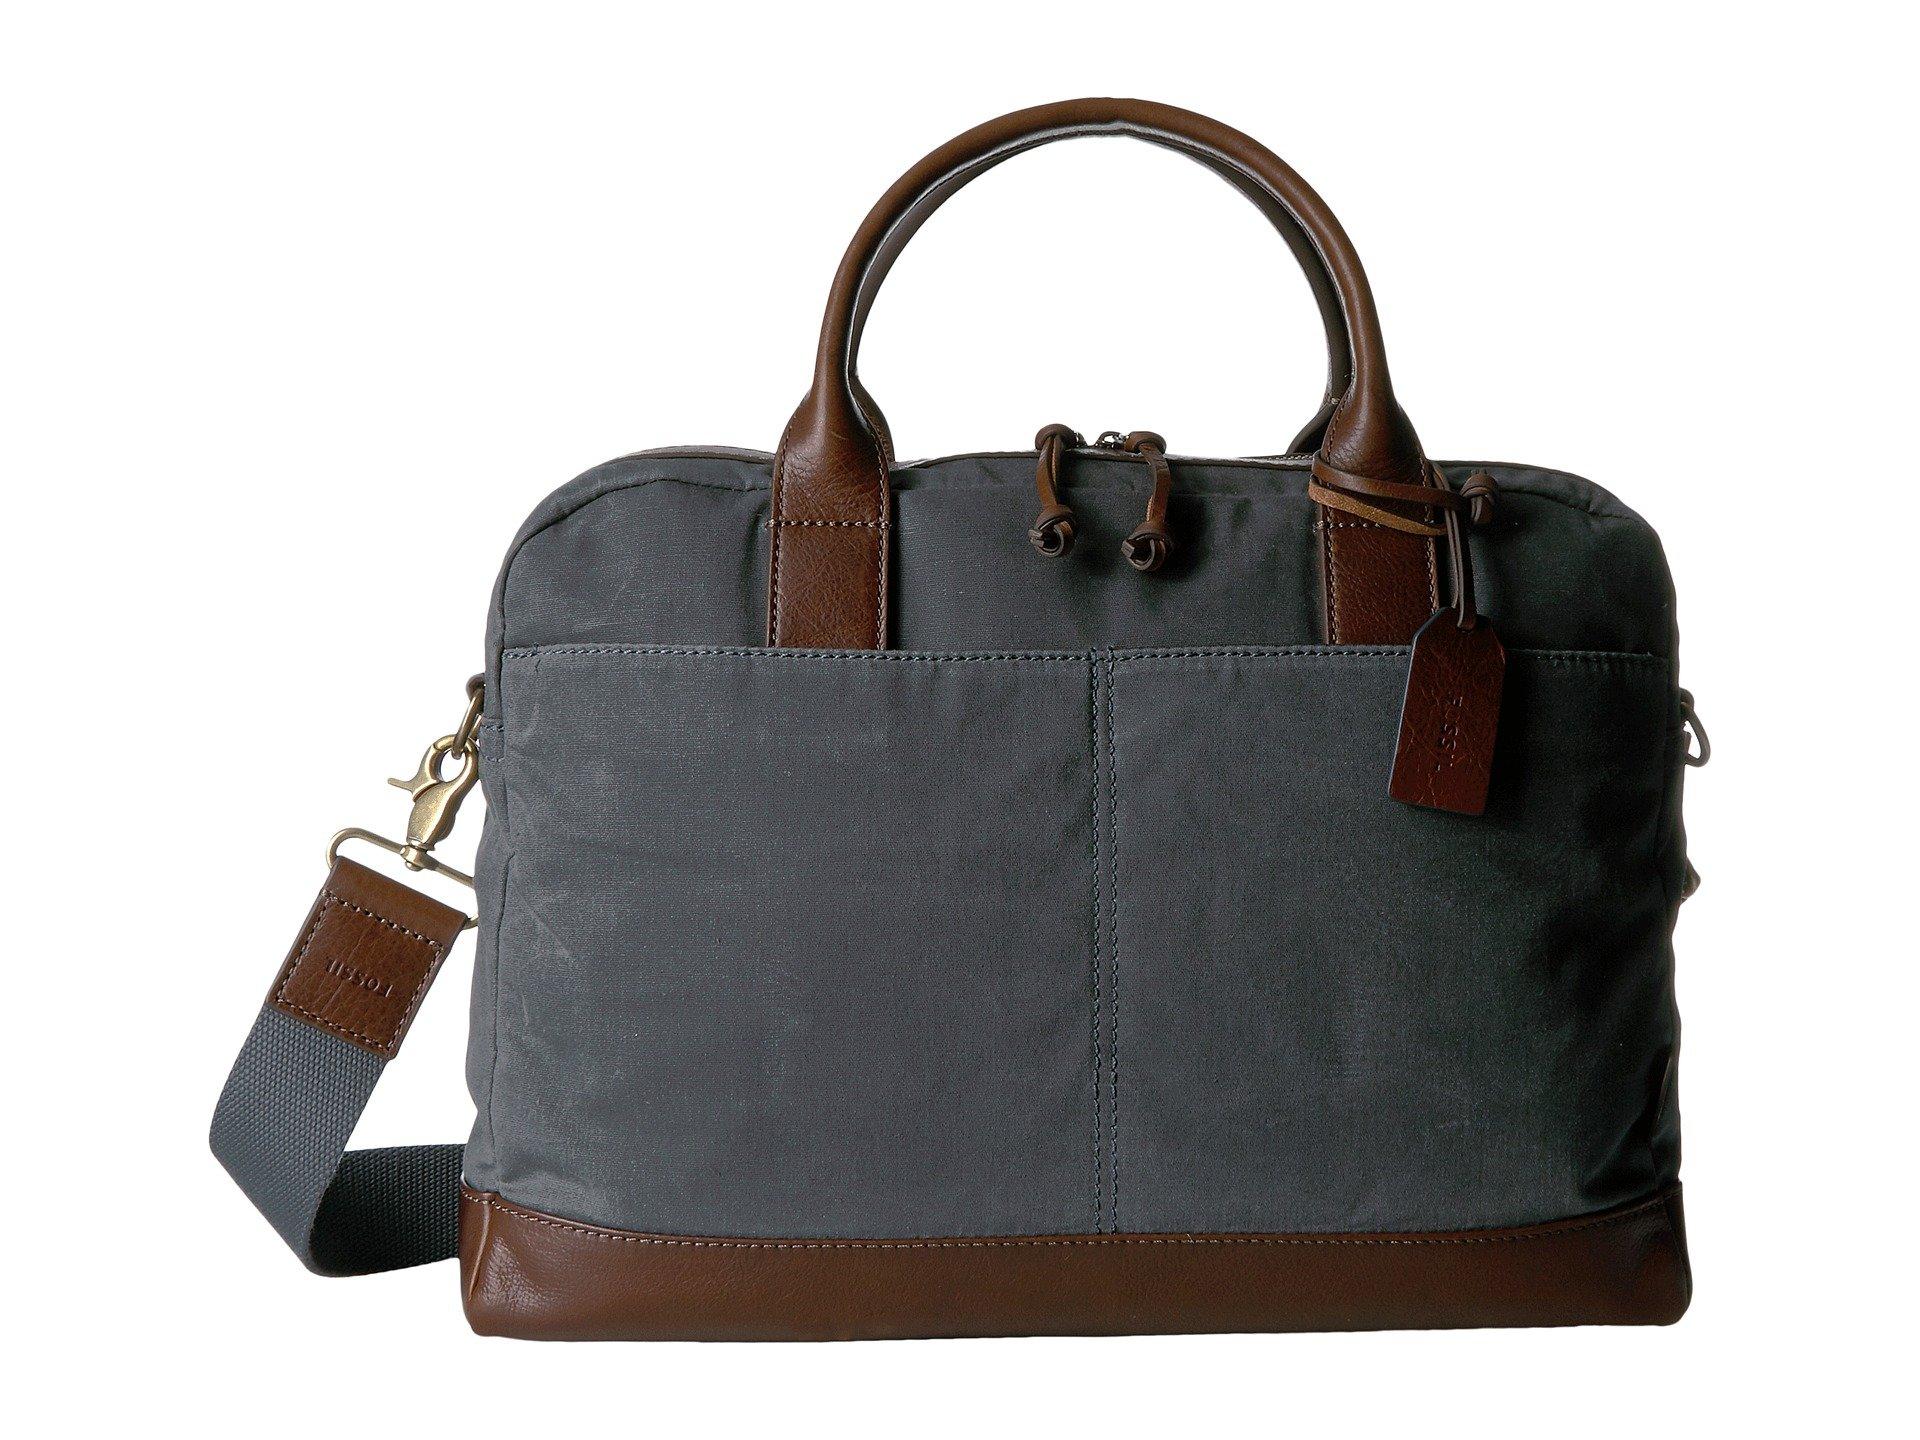 Maletin para Hombre Fossil Wyatt Top Zip Workbag  + Fossil en VeoyCompro.net